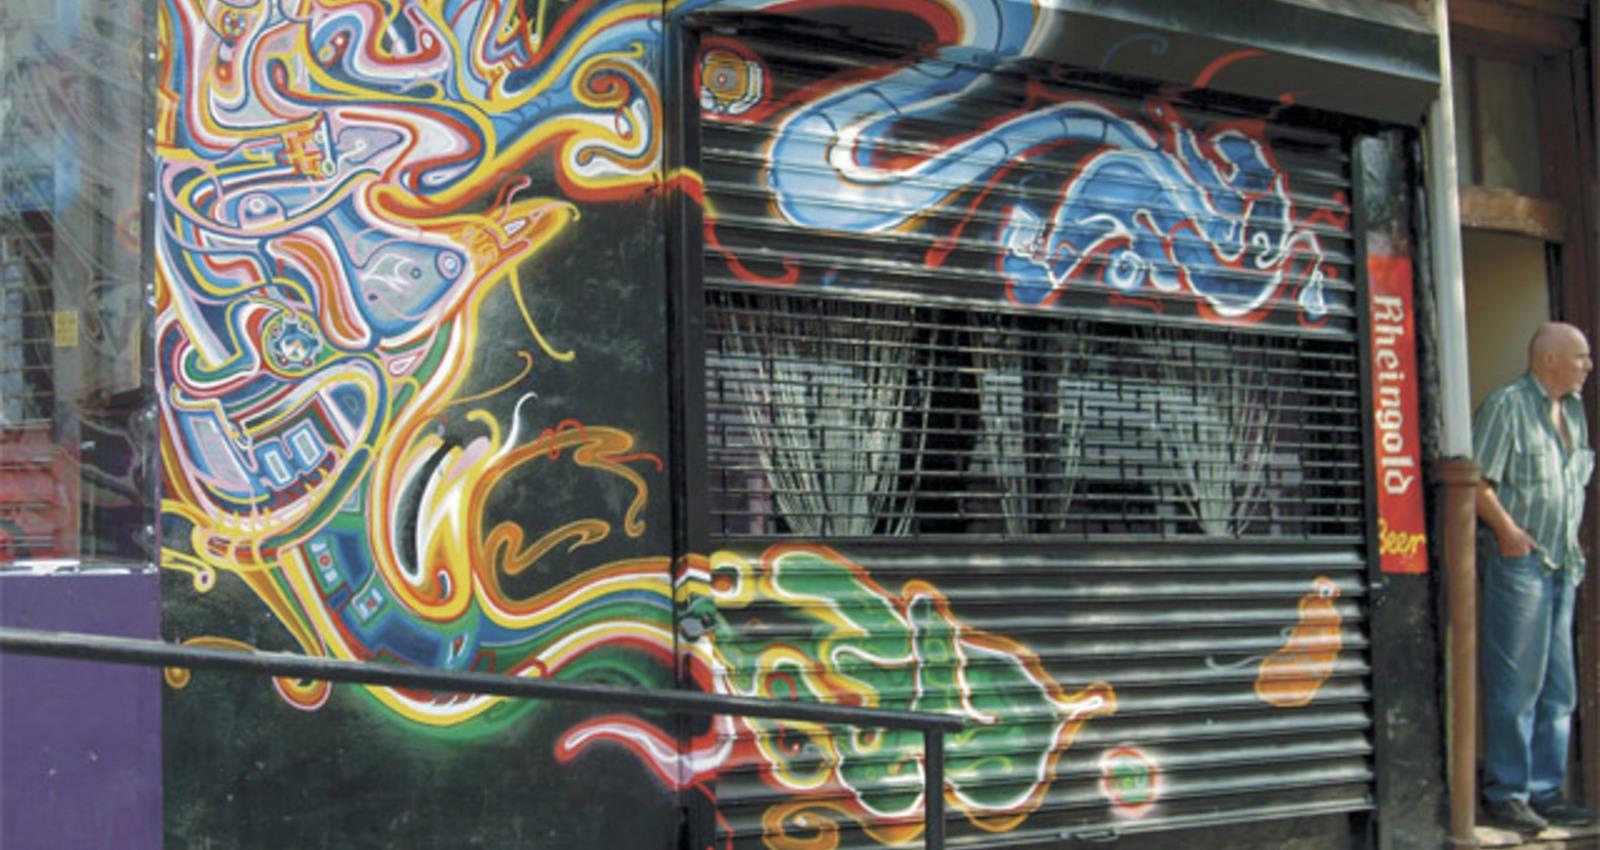 Rheingold Street Artist Nightshade Project